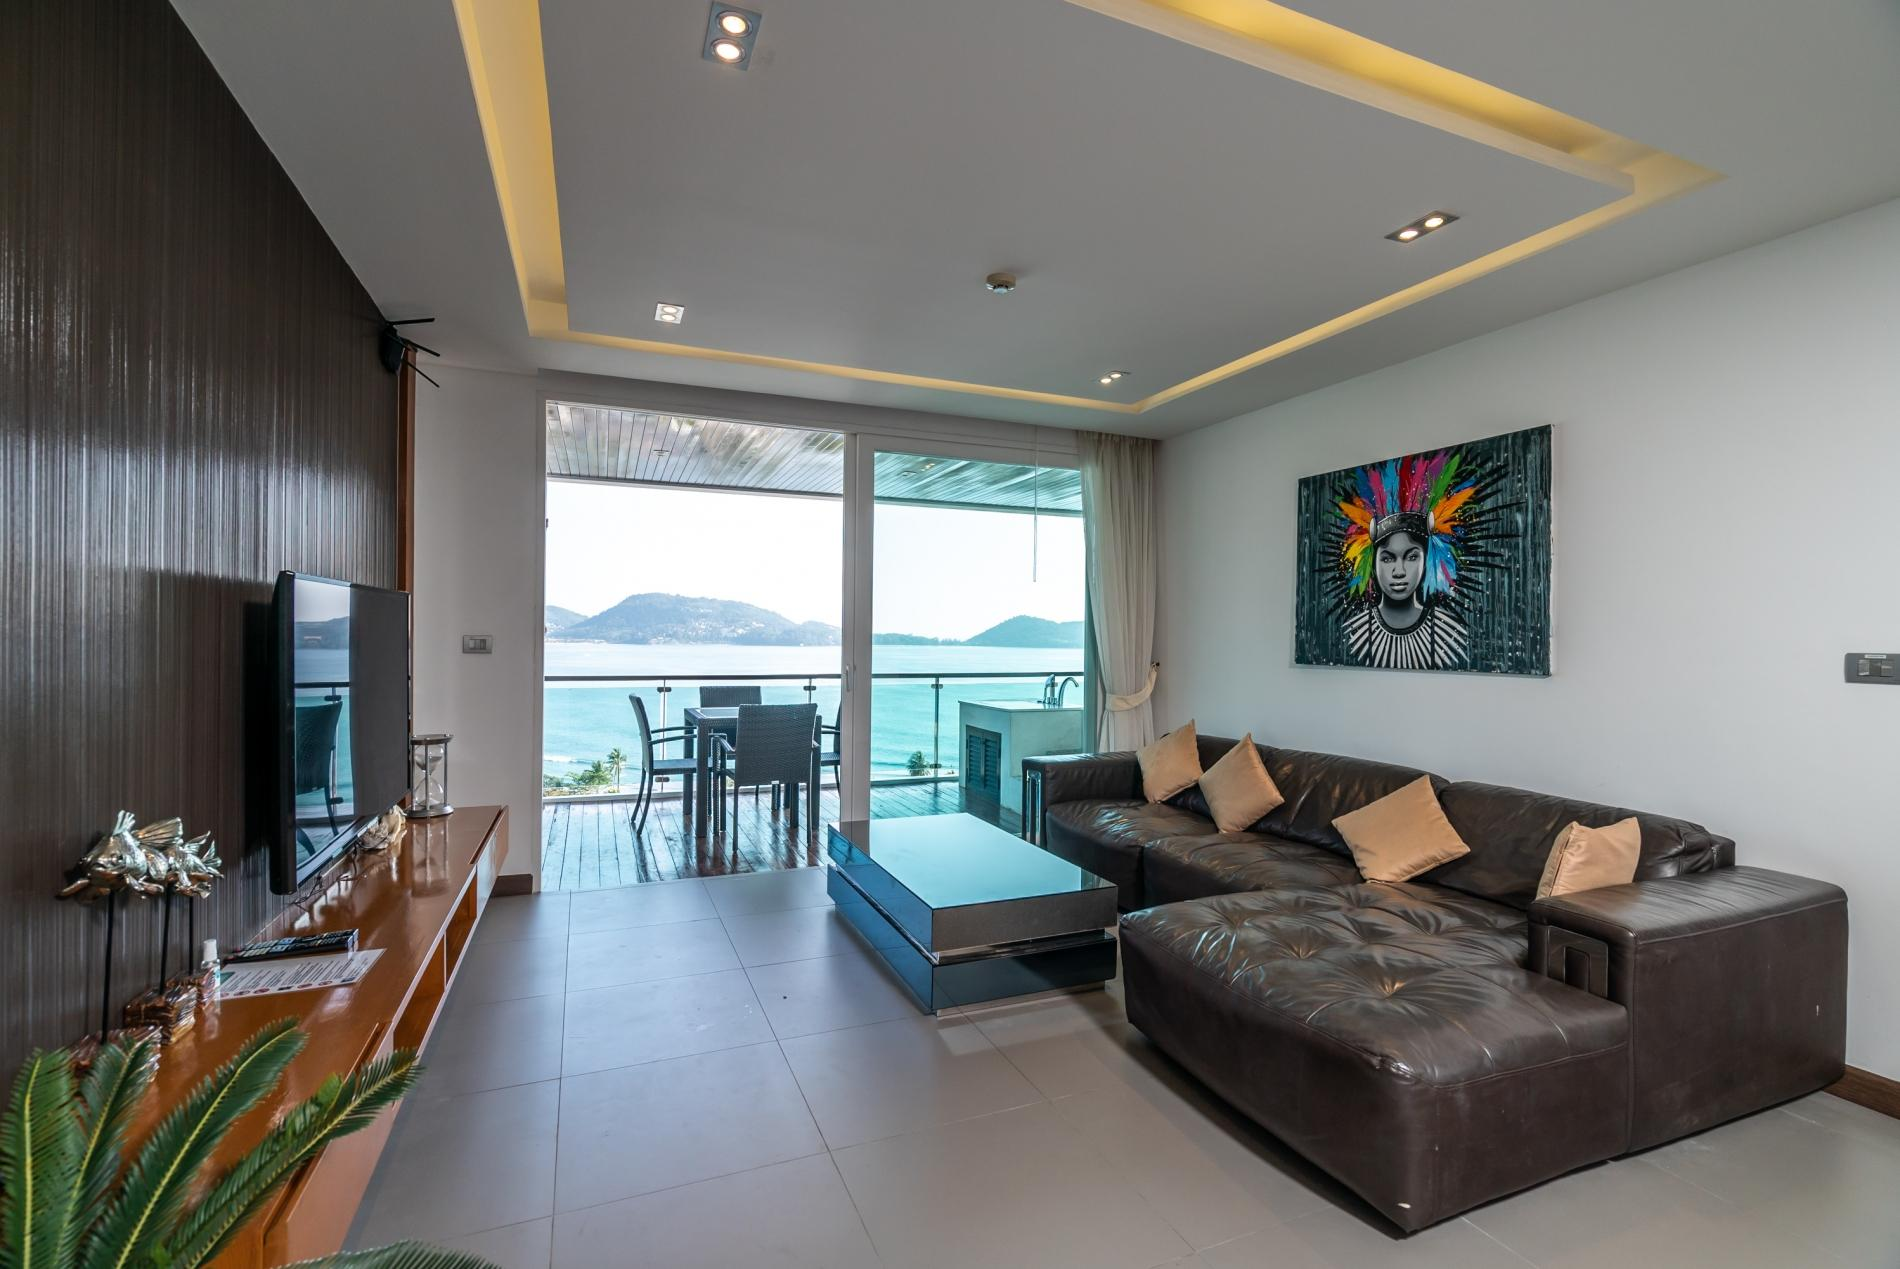 Apartment Privilege12 - Seaview 3 bedroom luxury apartment on Kalim bay photo 20384393